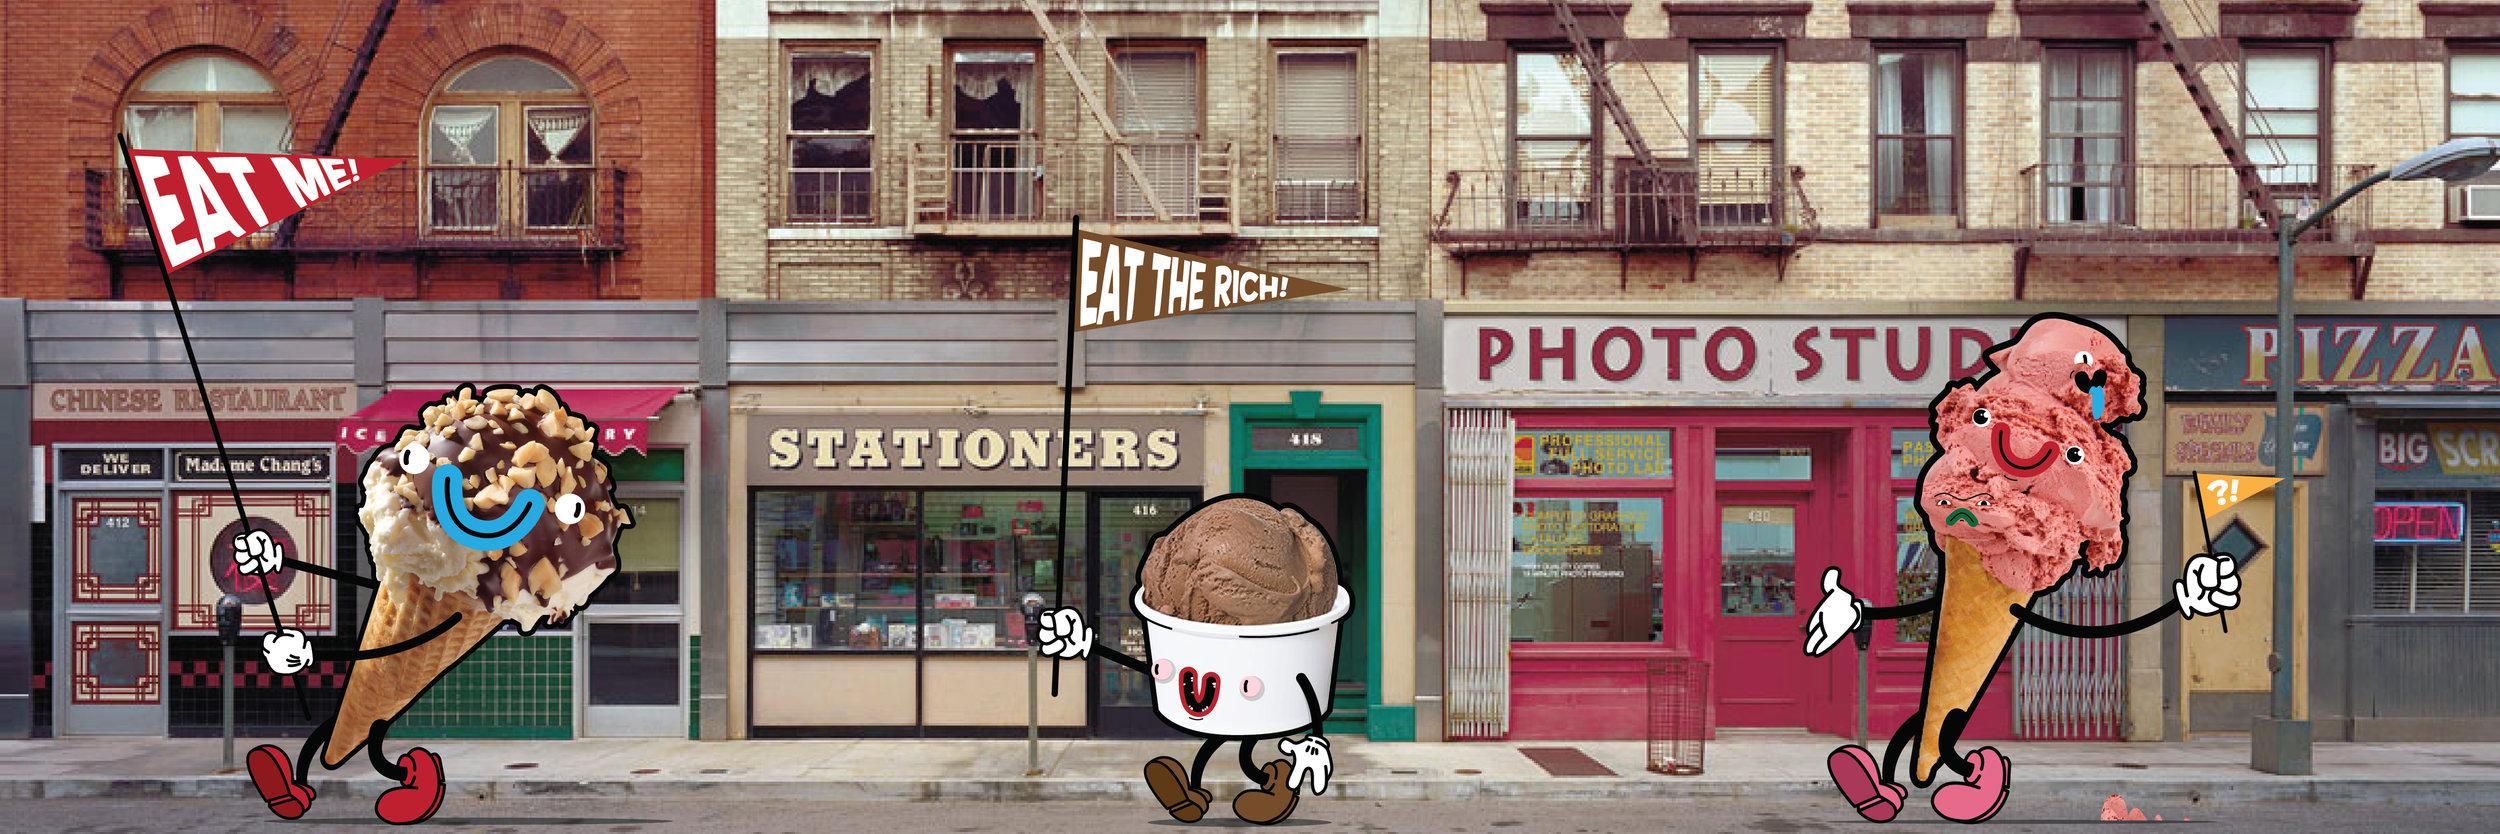 rude ice cream-02.jpg